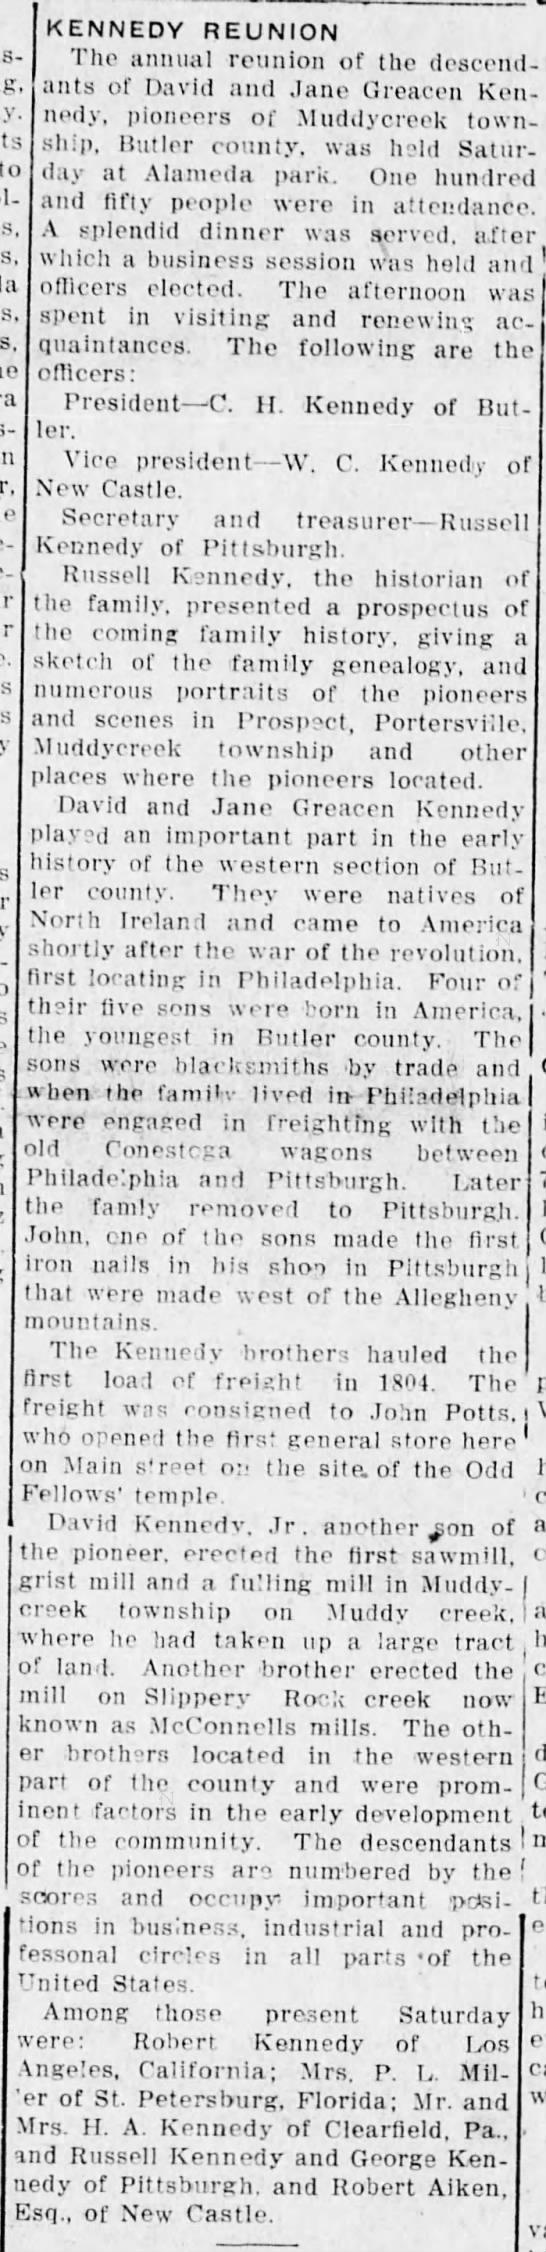 kennedy reunion 1915